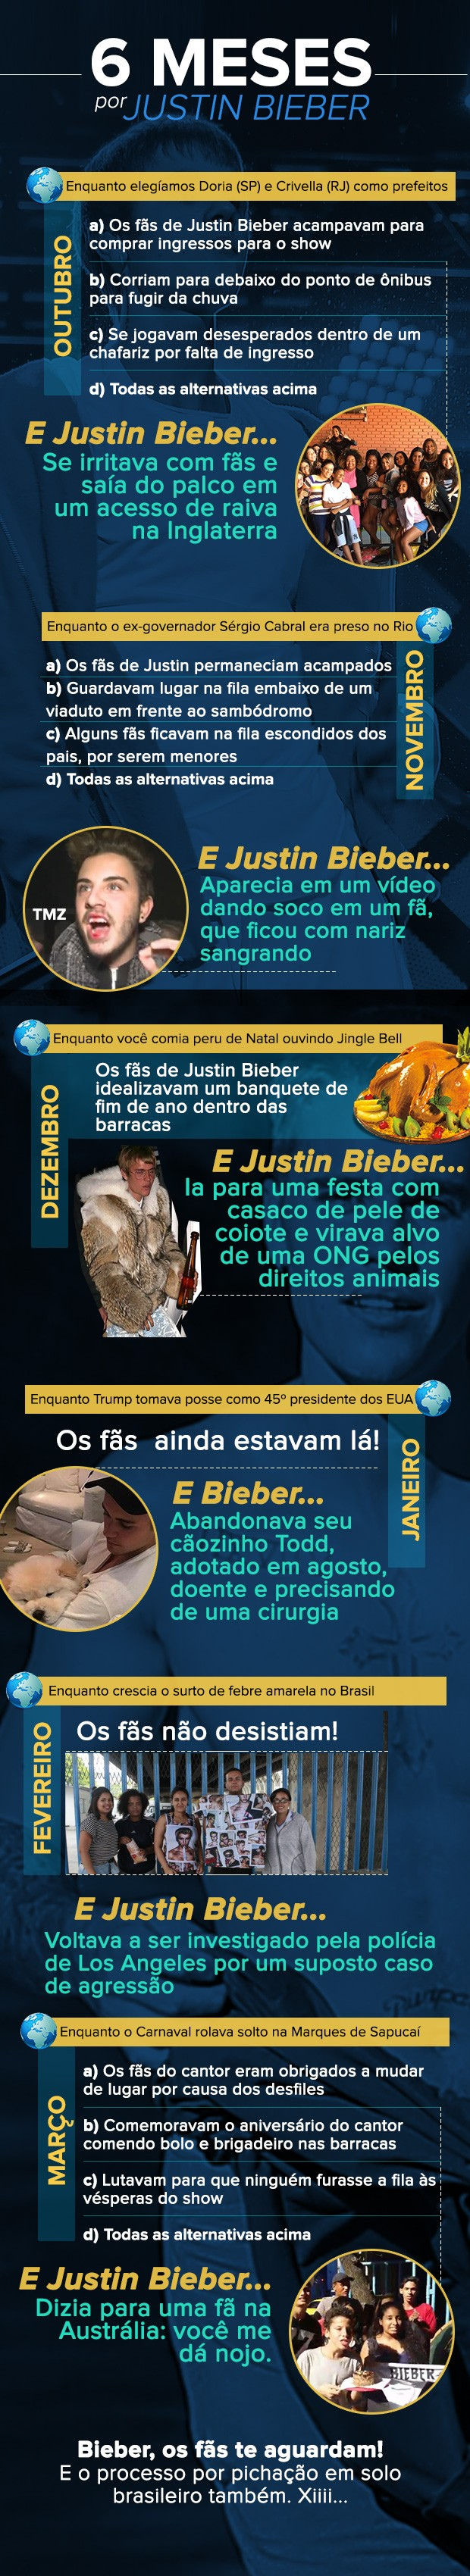 6 meses por Justin Bieber (Foto: Juliana Pinna / EGO)